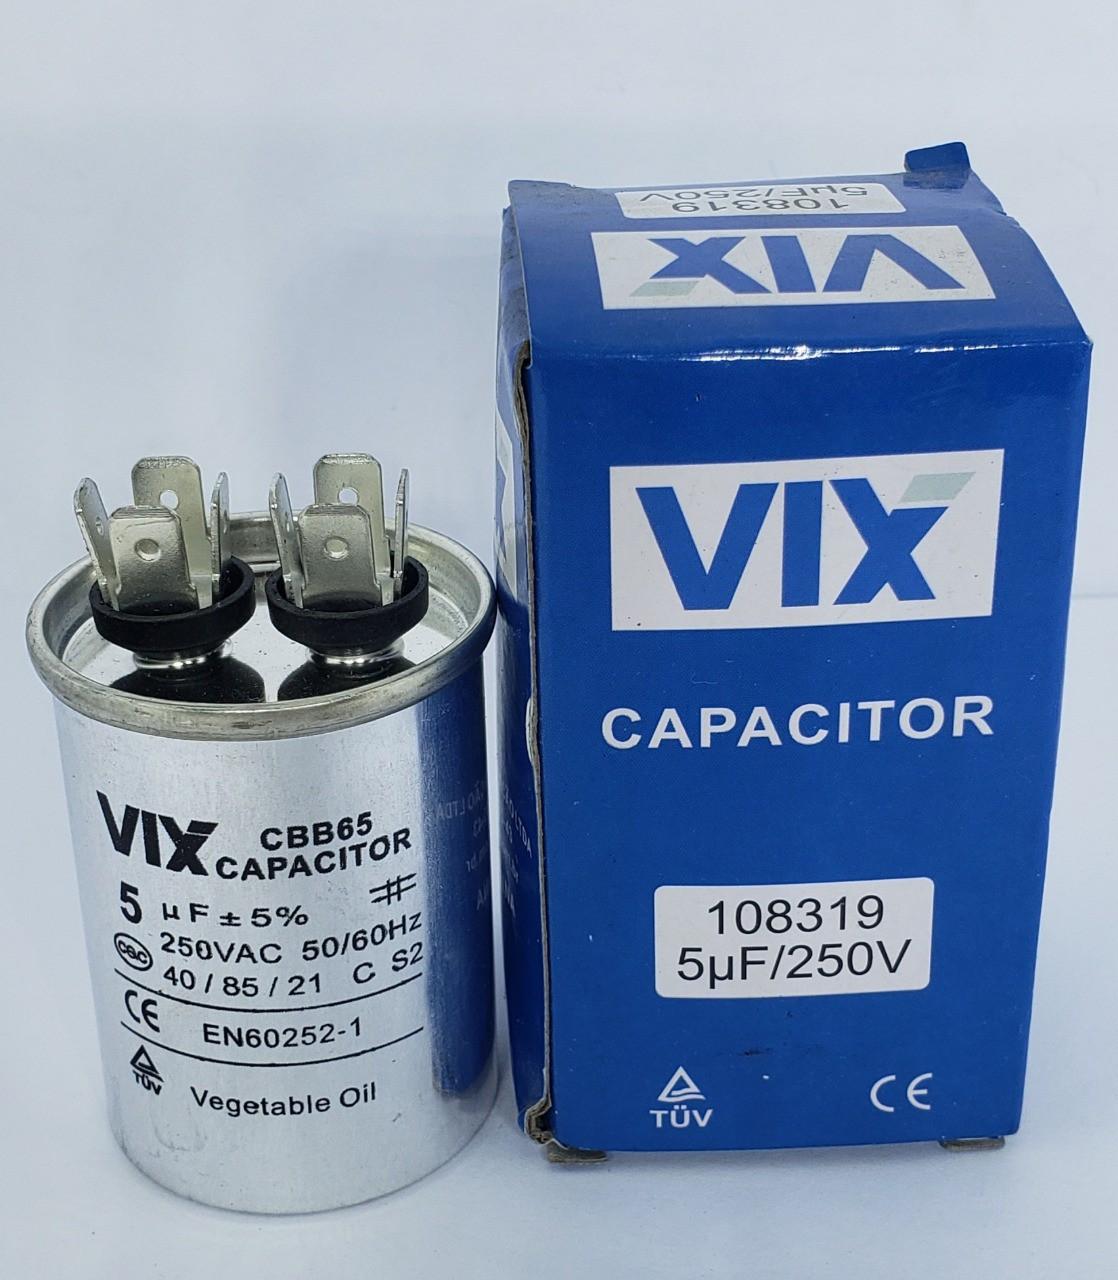 Capacitor 5uf 250v Vix